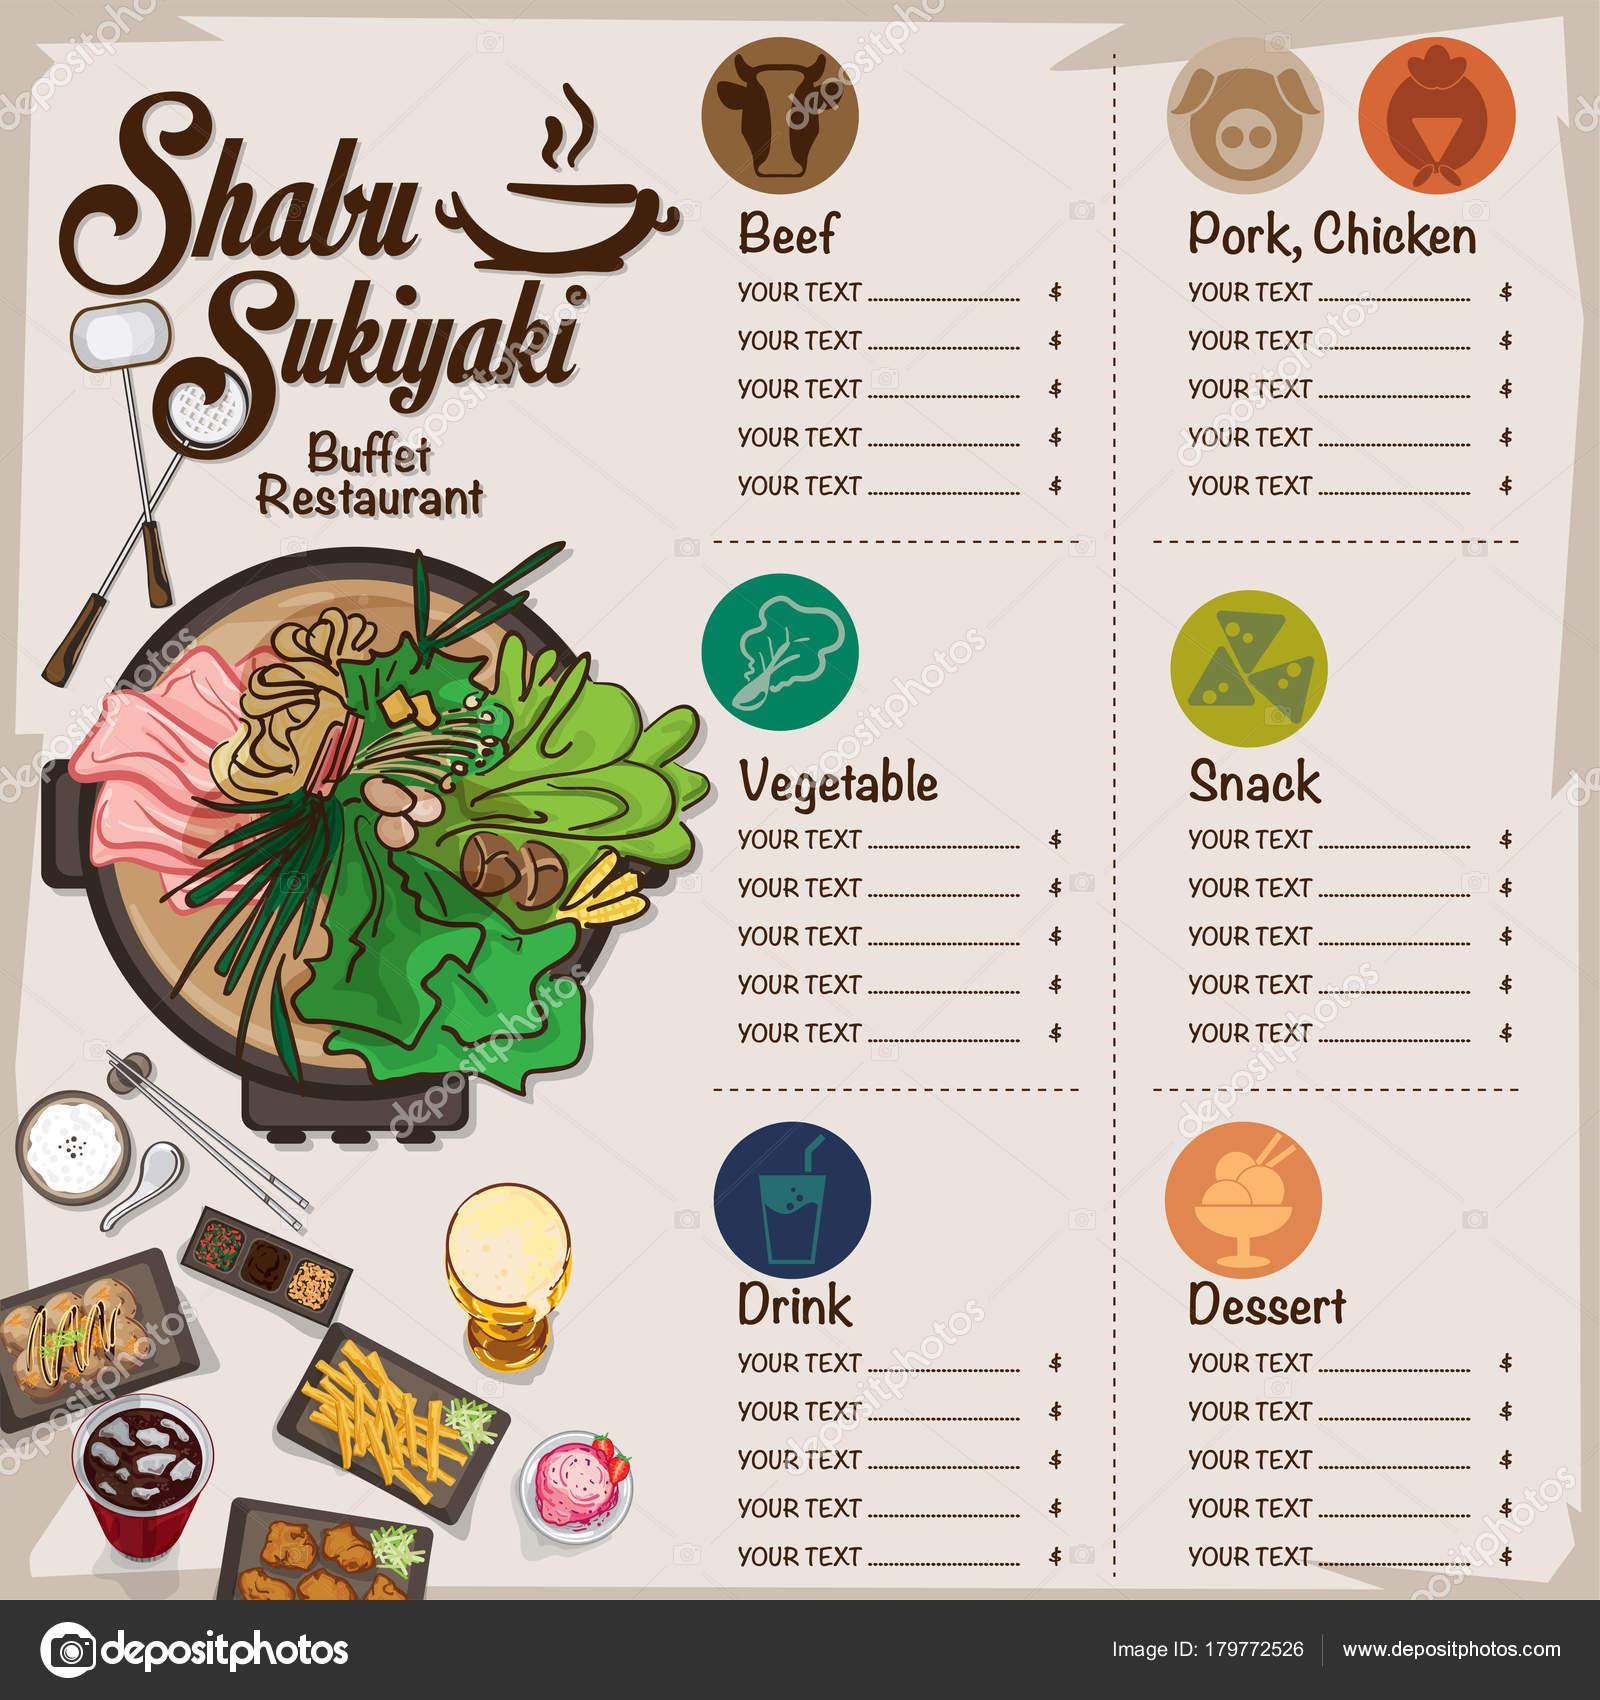 Shabu Sukiyaki Restaurante Plantilla Diseño Gráfico Objetos Menú ...